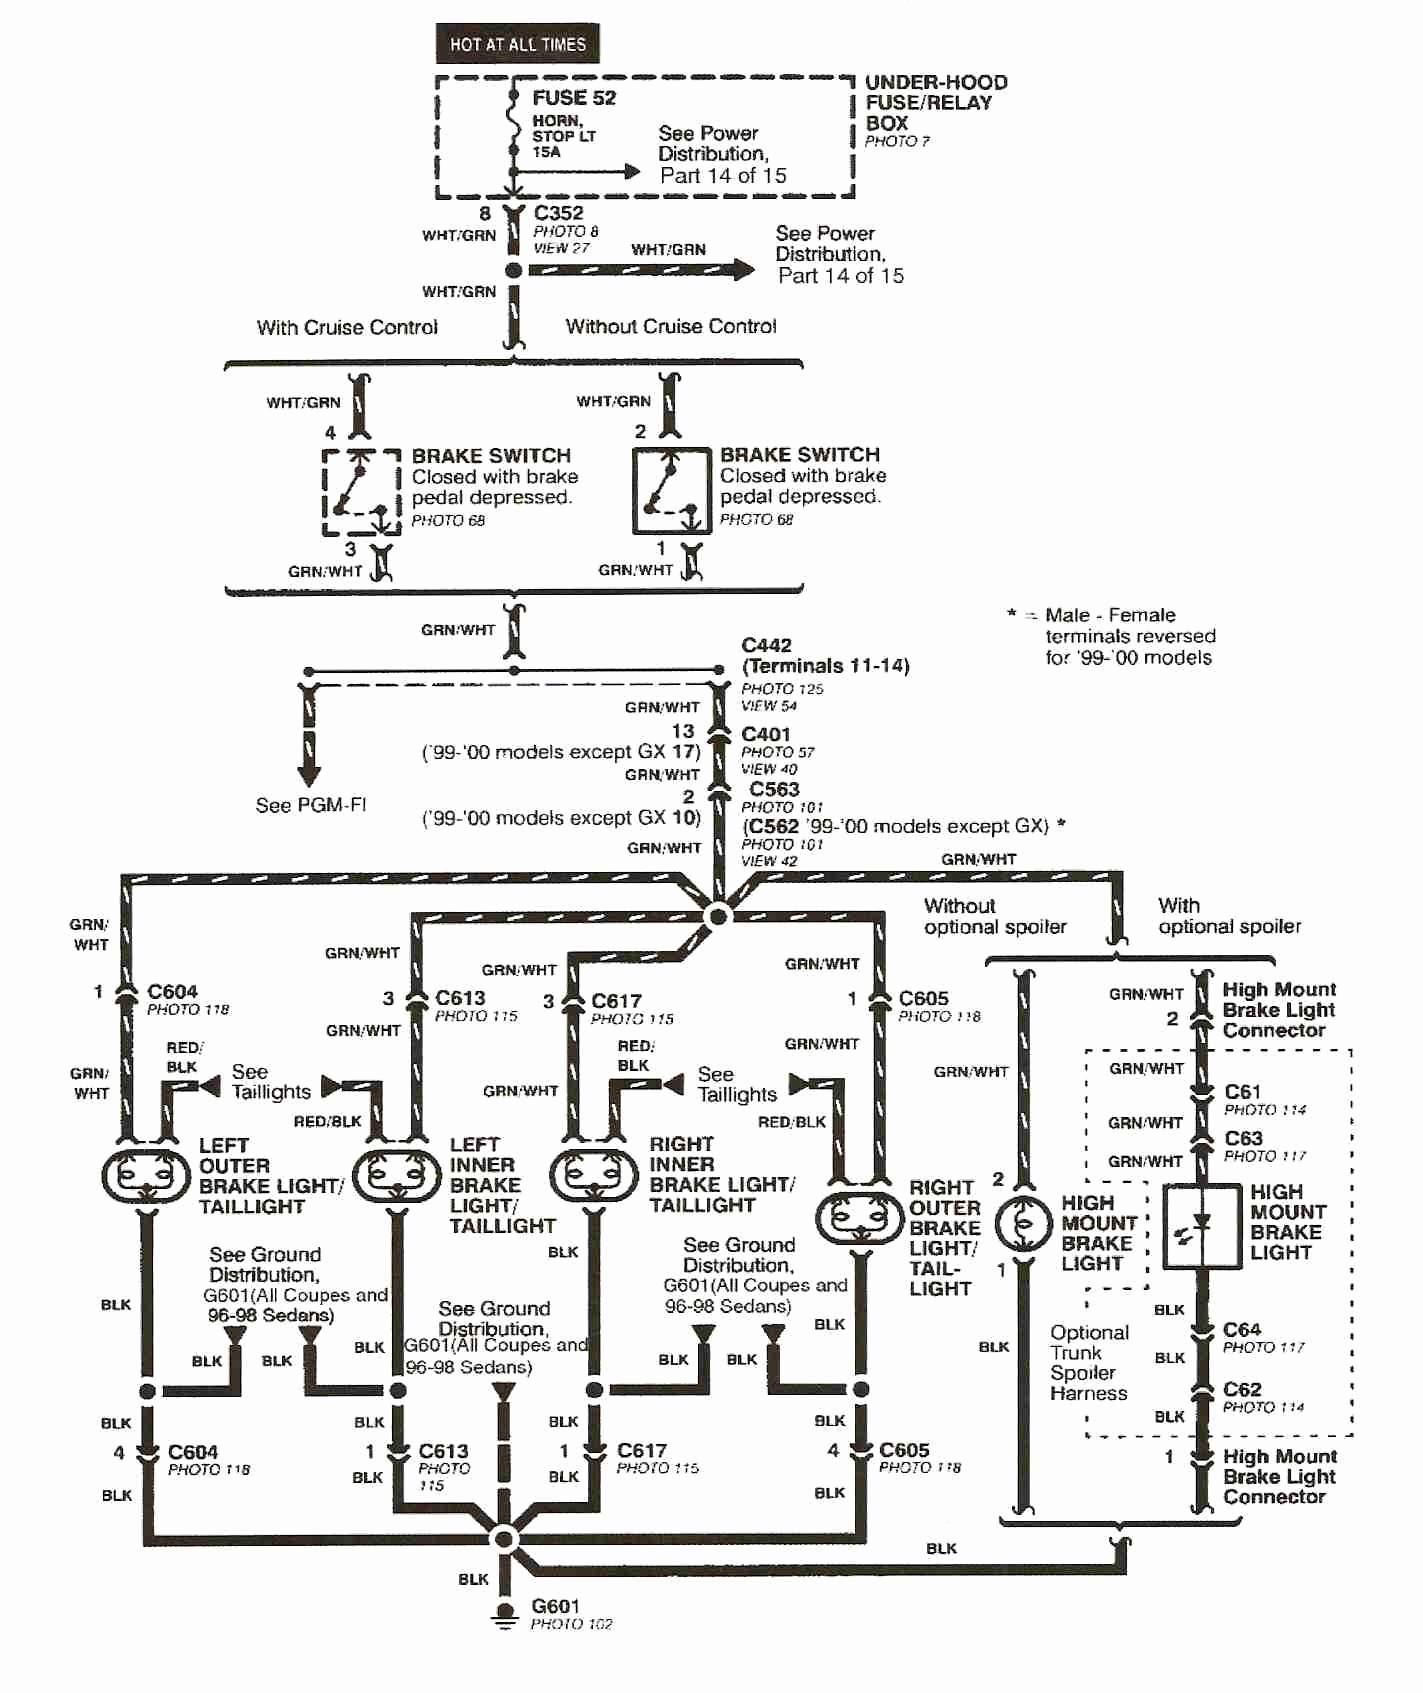 2000 Honda Civic Wiring Diagram 2000 Honda Civic Wiring Diagram Of 2000 Honda Civic Wiring Diagram